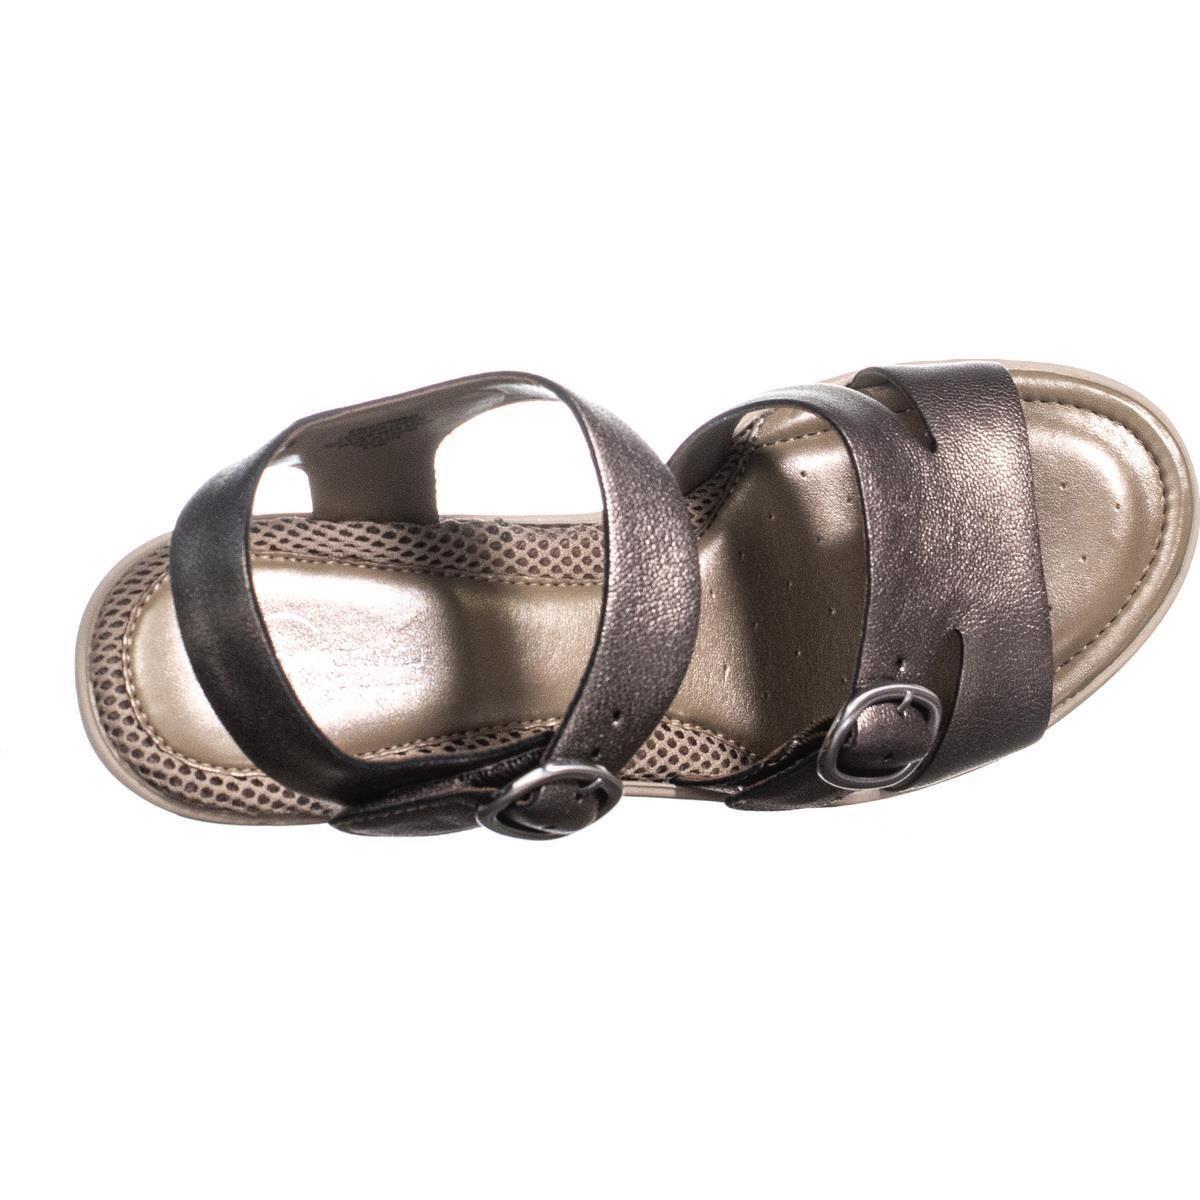 59eca6d9ce3 Lyst - Easy Spirit Charisma Ankle Strap Comfort Wedge Sandals